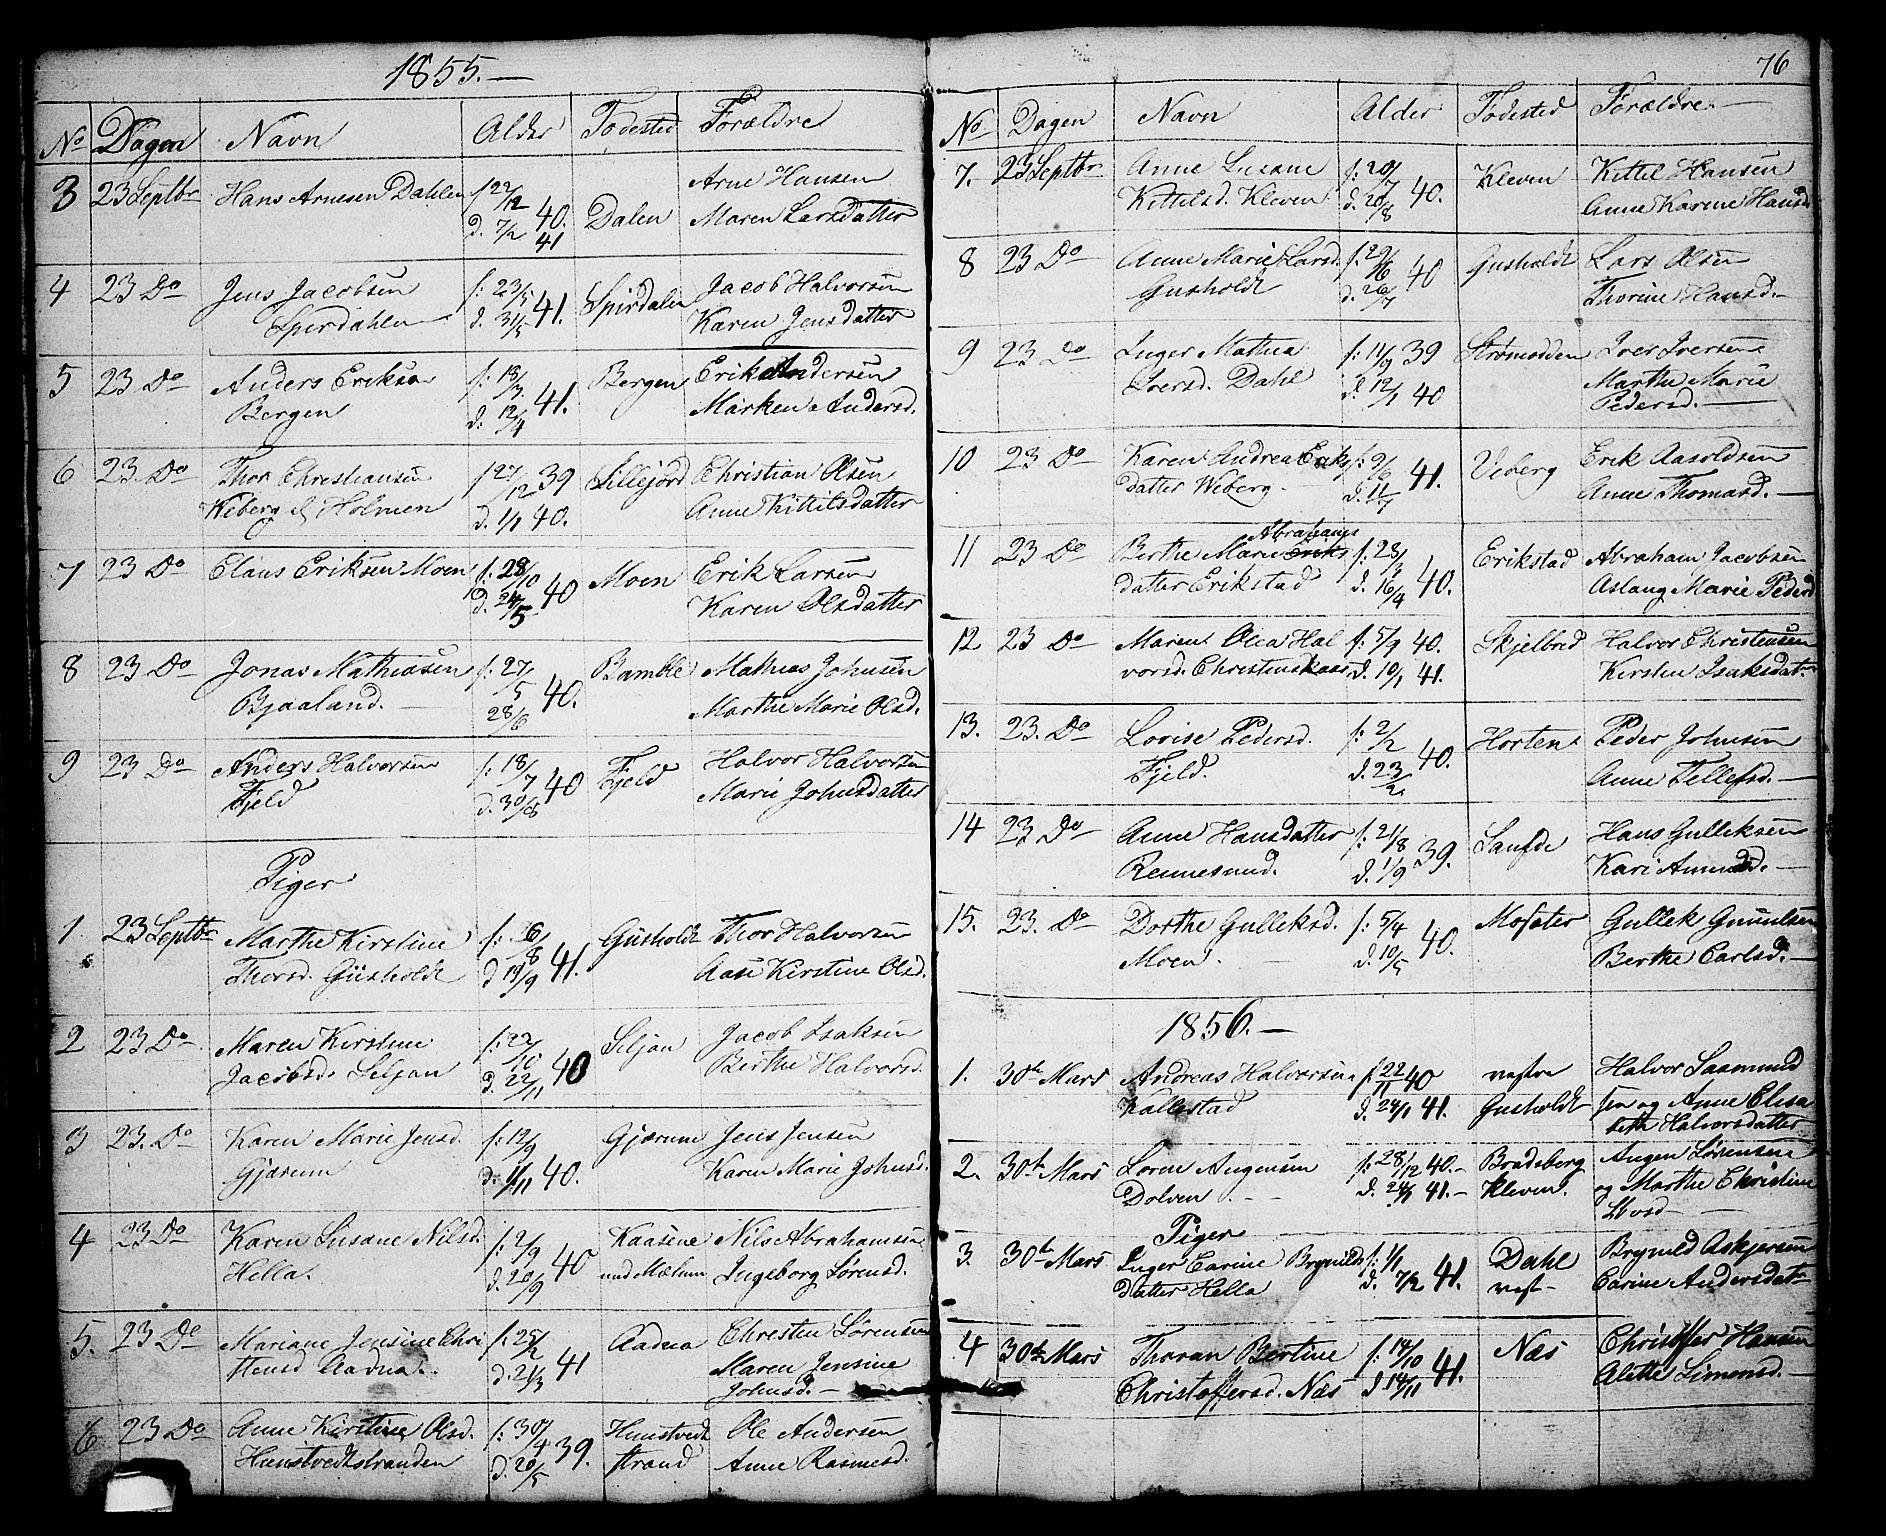 SAKO, Solum kirkebøker, G/Gb/L0001: Klokkerbok nr. II 1, 1848-1859, s. 76